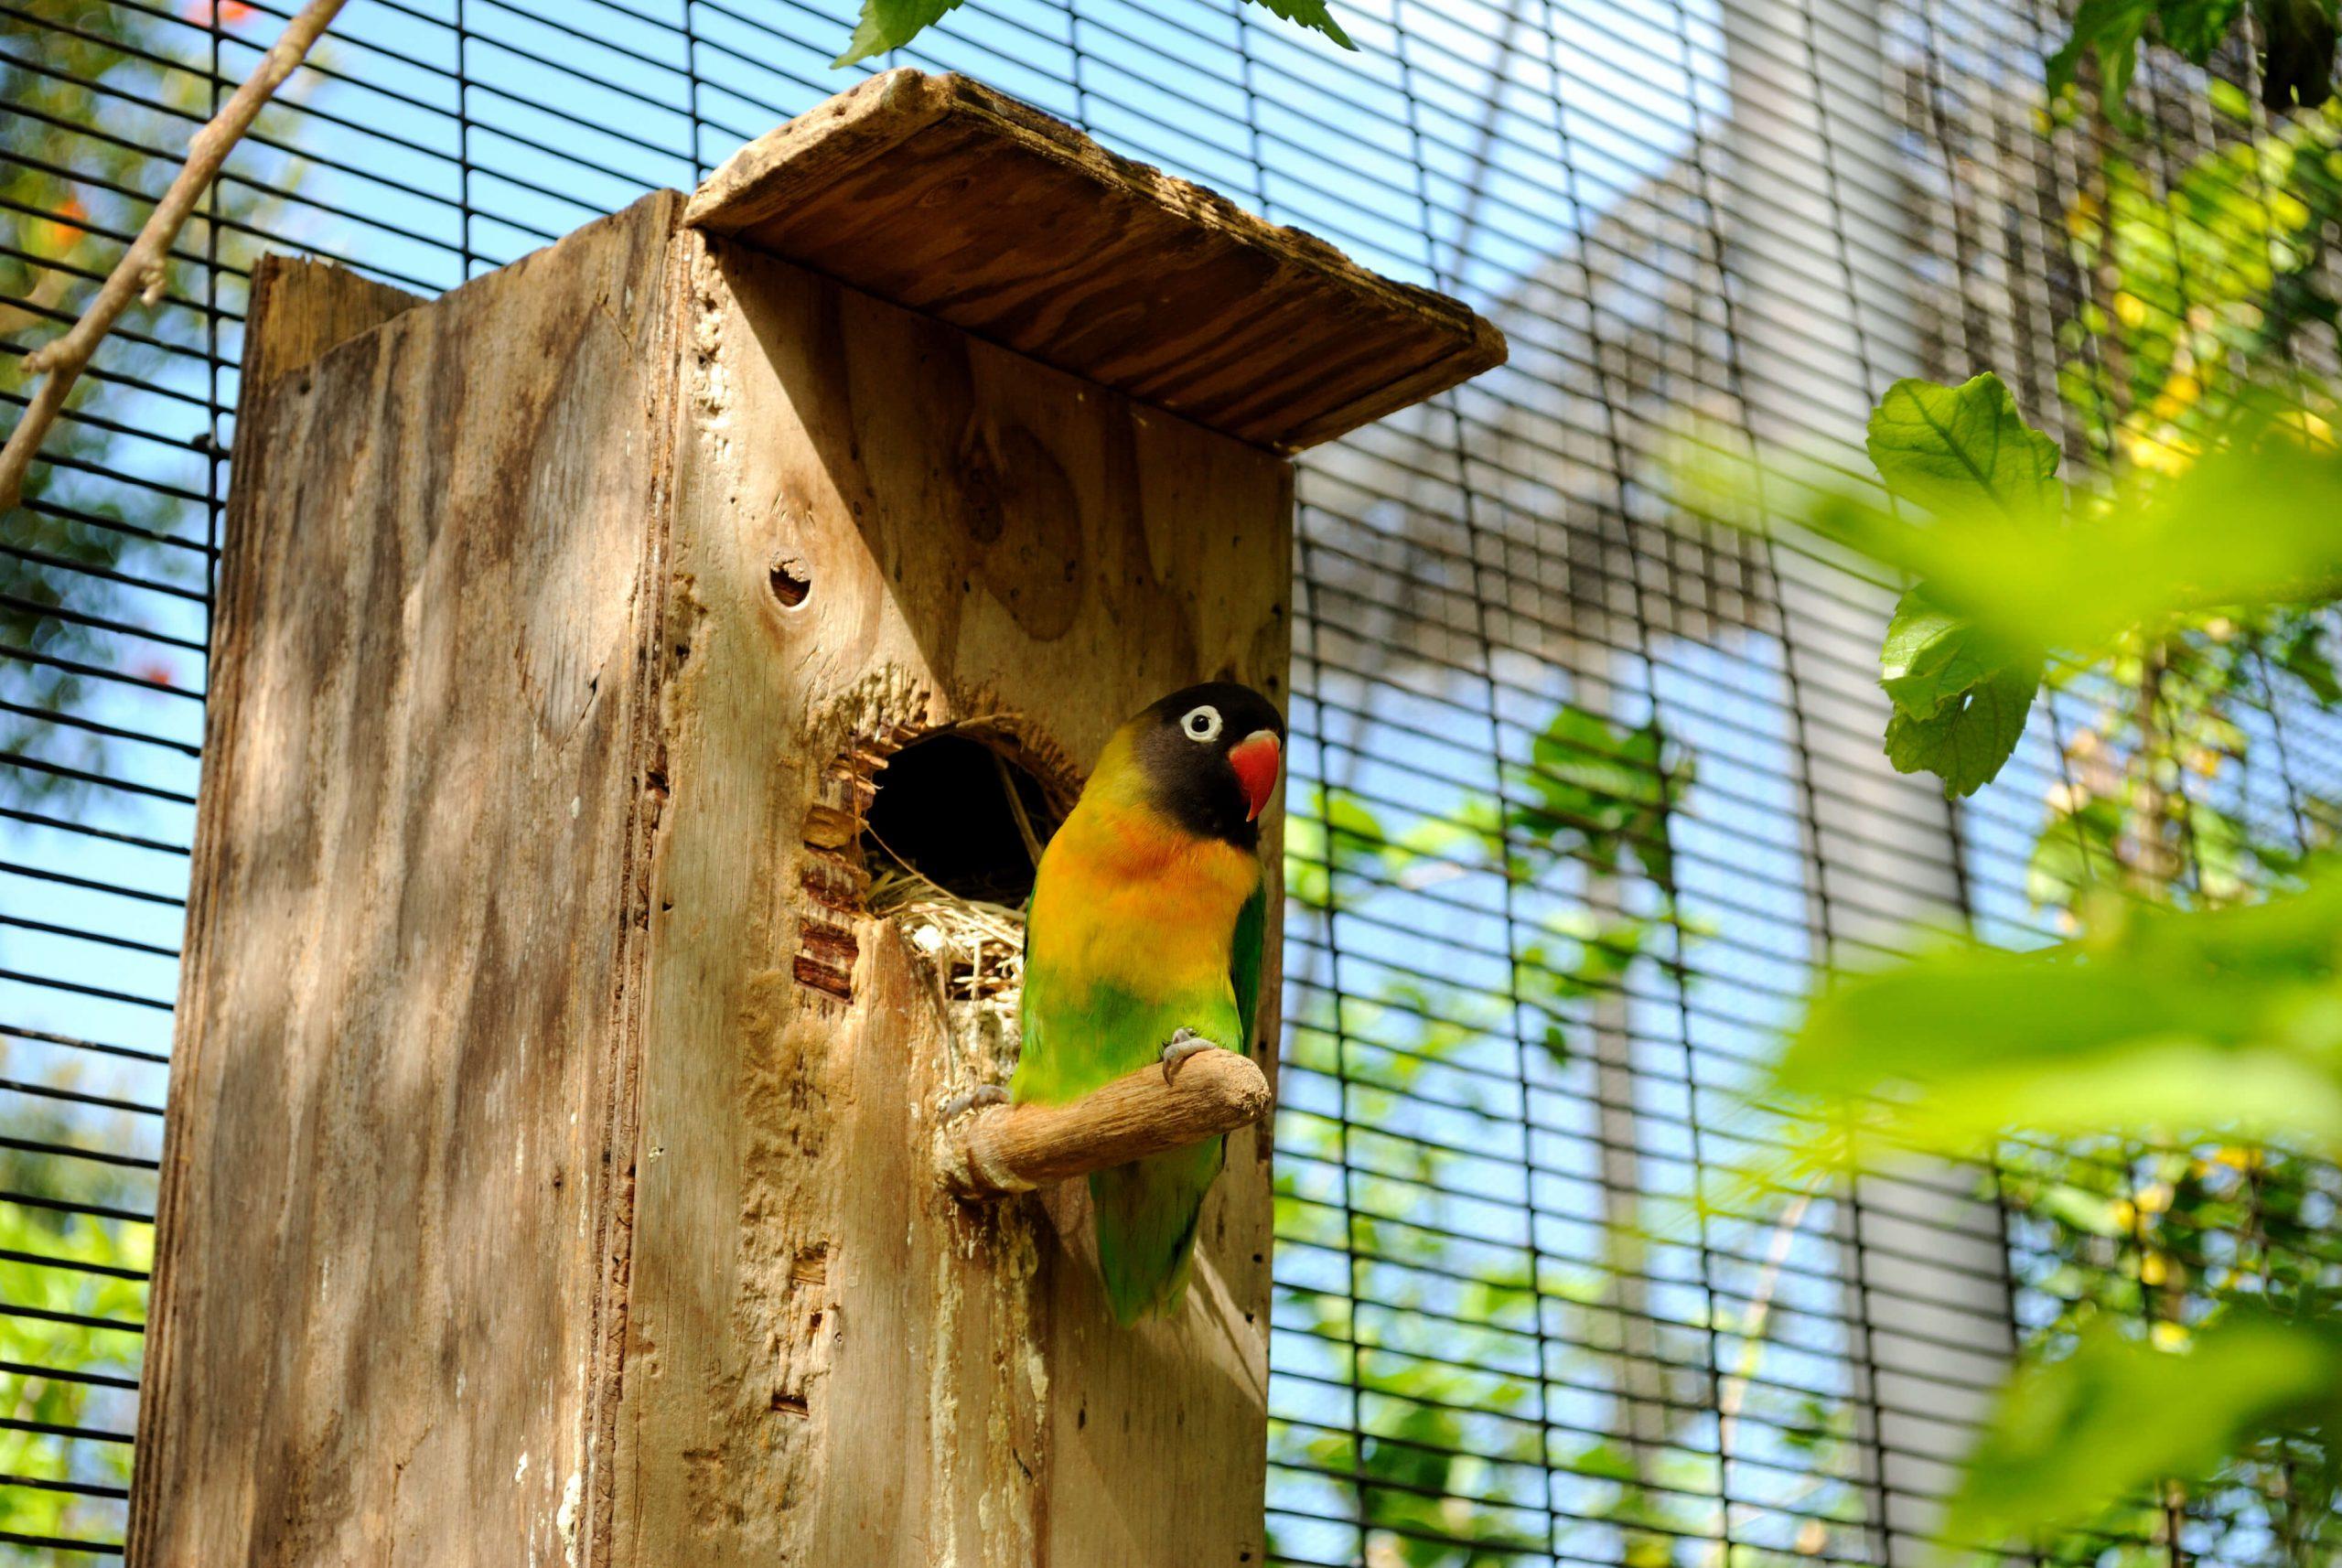 Cara Ternak Lovebird di dalam Rumah | Menyediakan Sangkar Burung